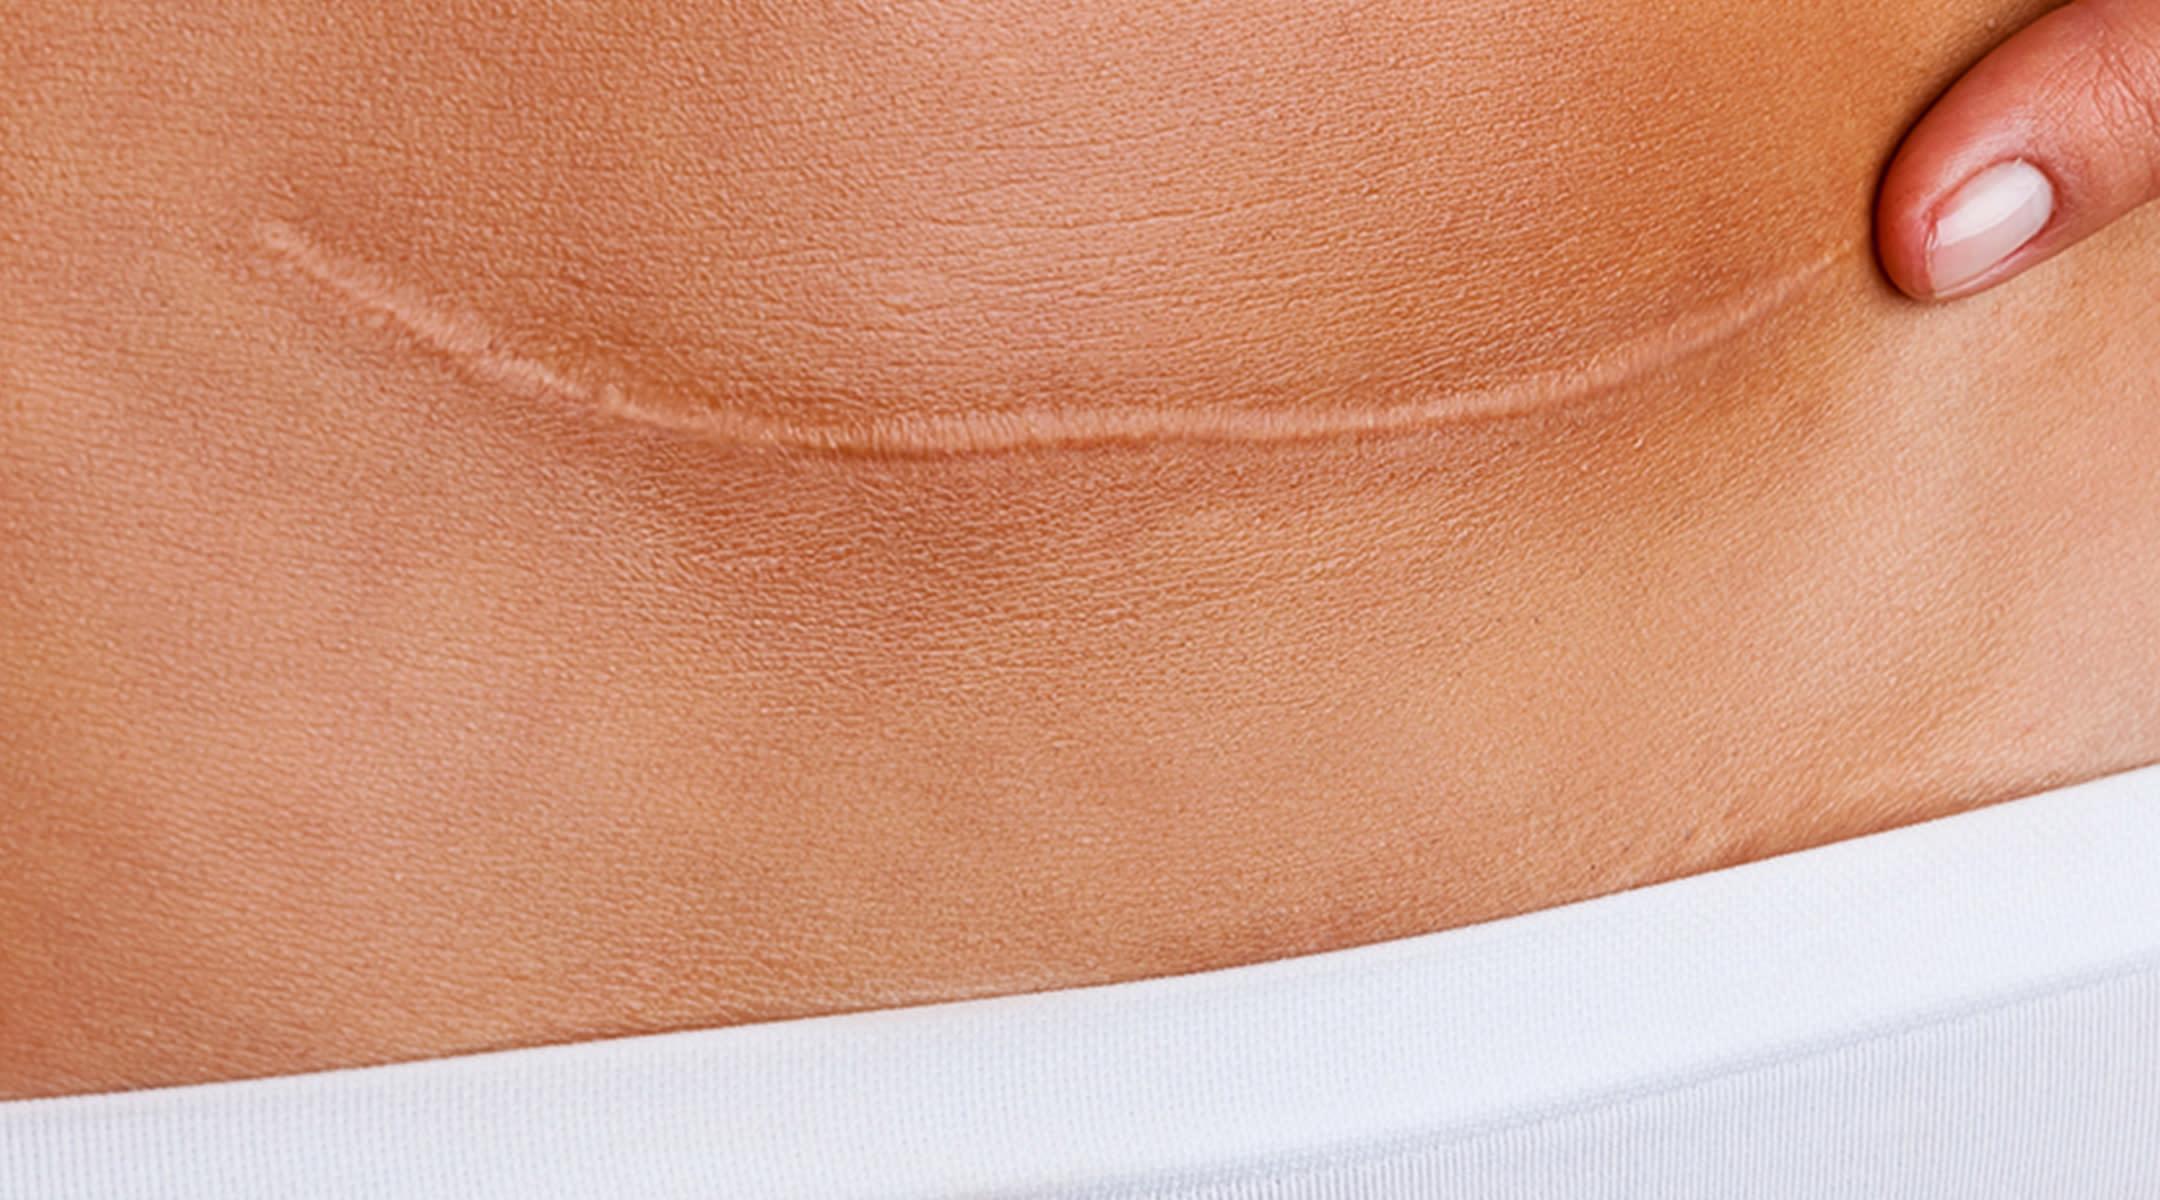 Cesarean section scar